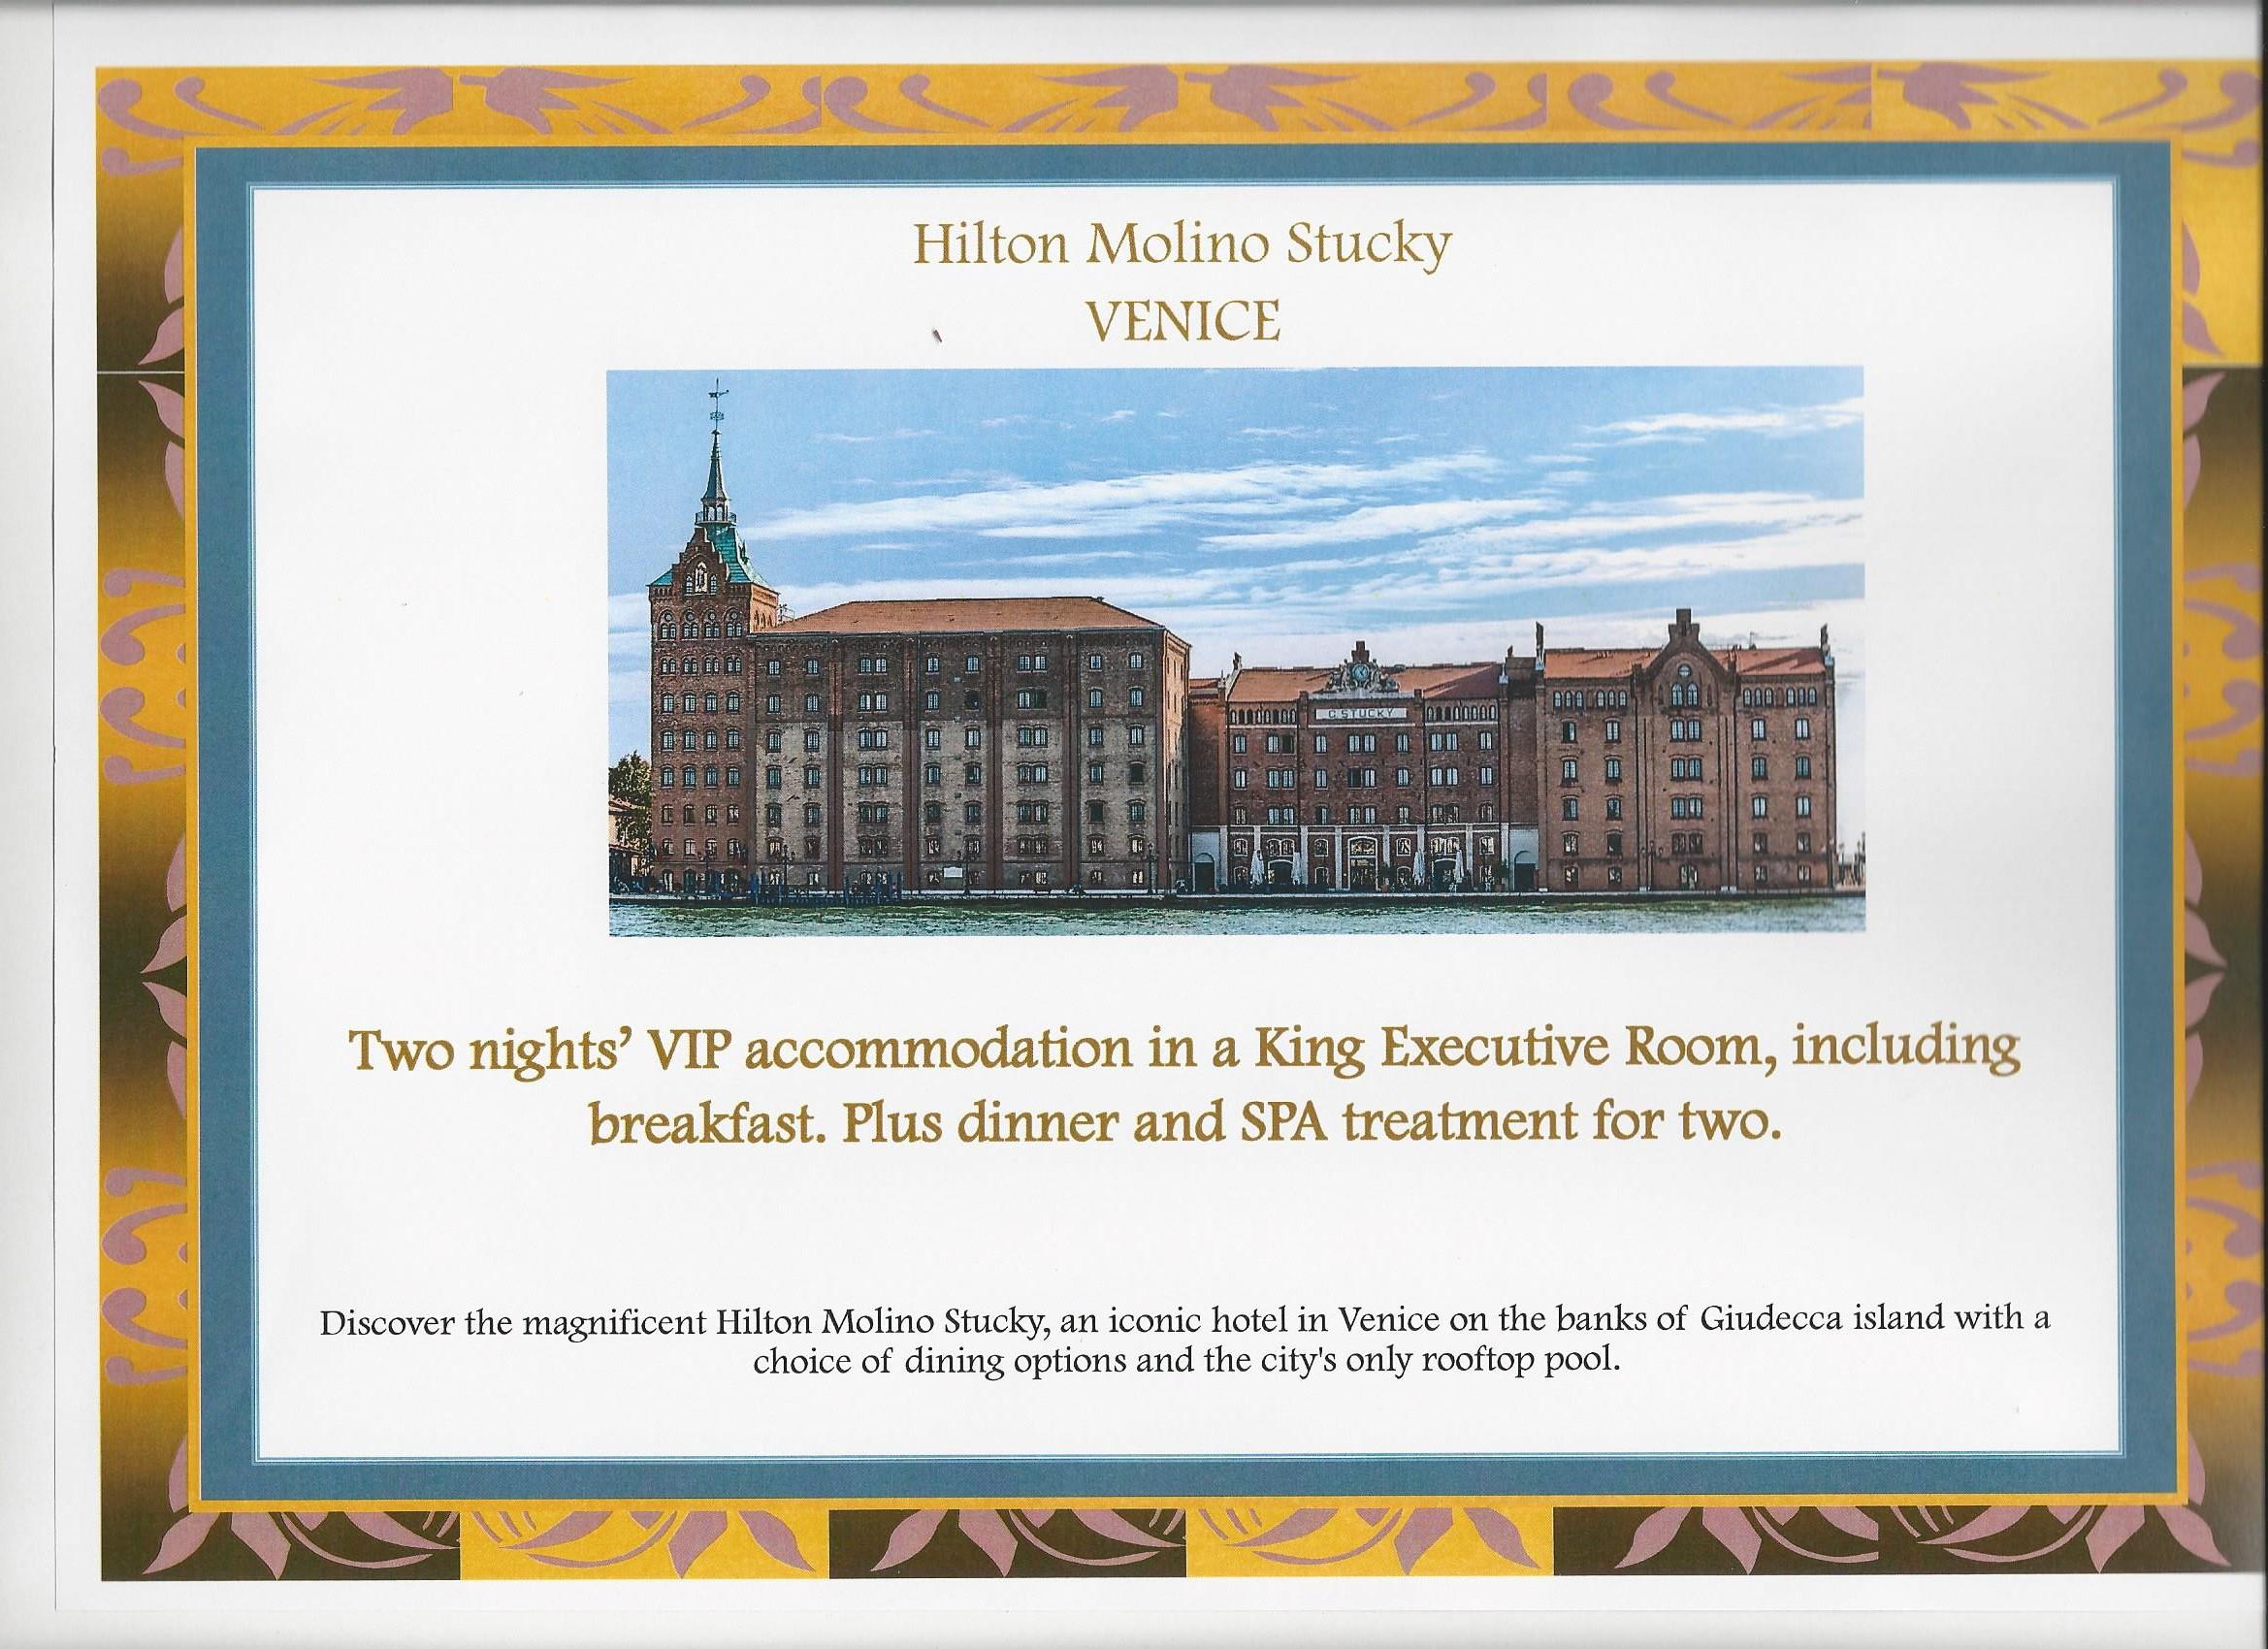 Hilton Molino Stucky, Venice